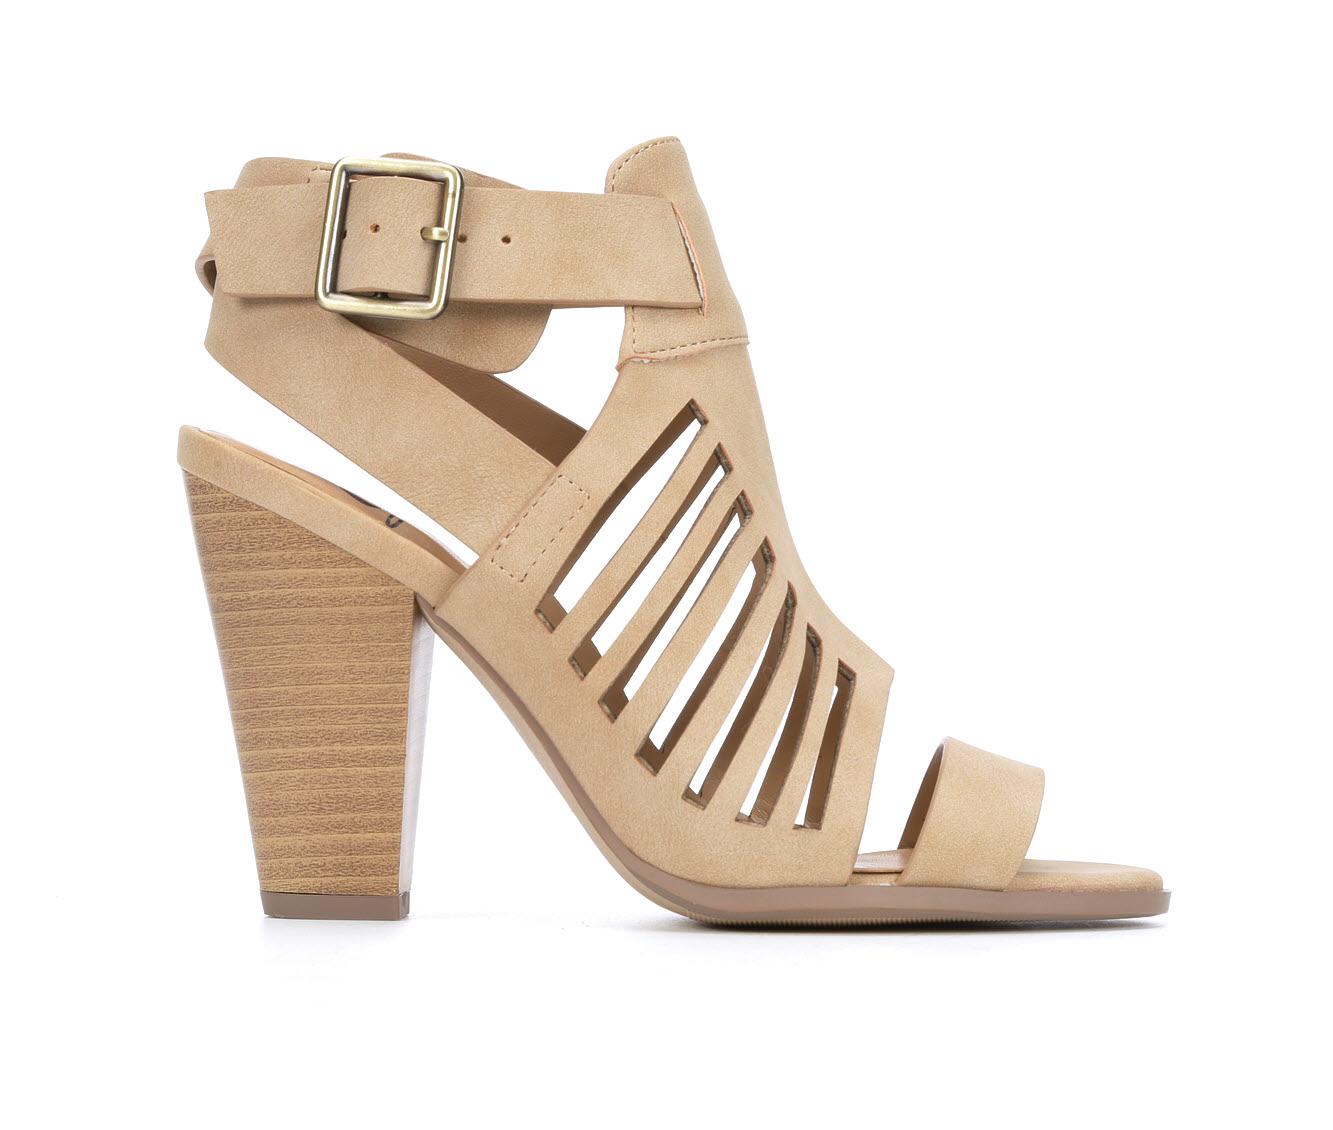 Delicious Yummy Women's Dress Shoe (Beige Faux Leather)